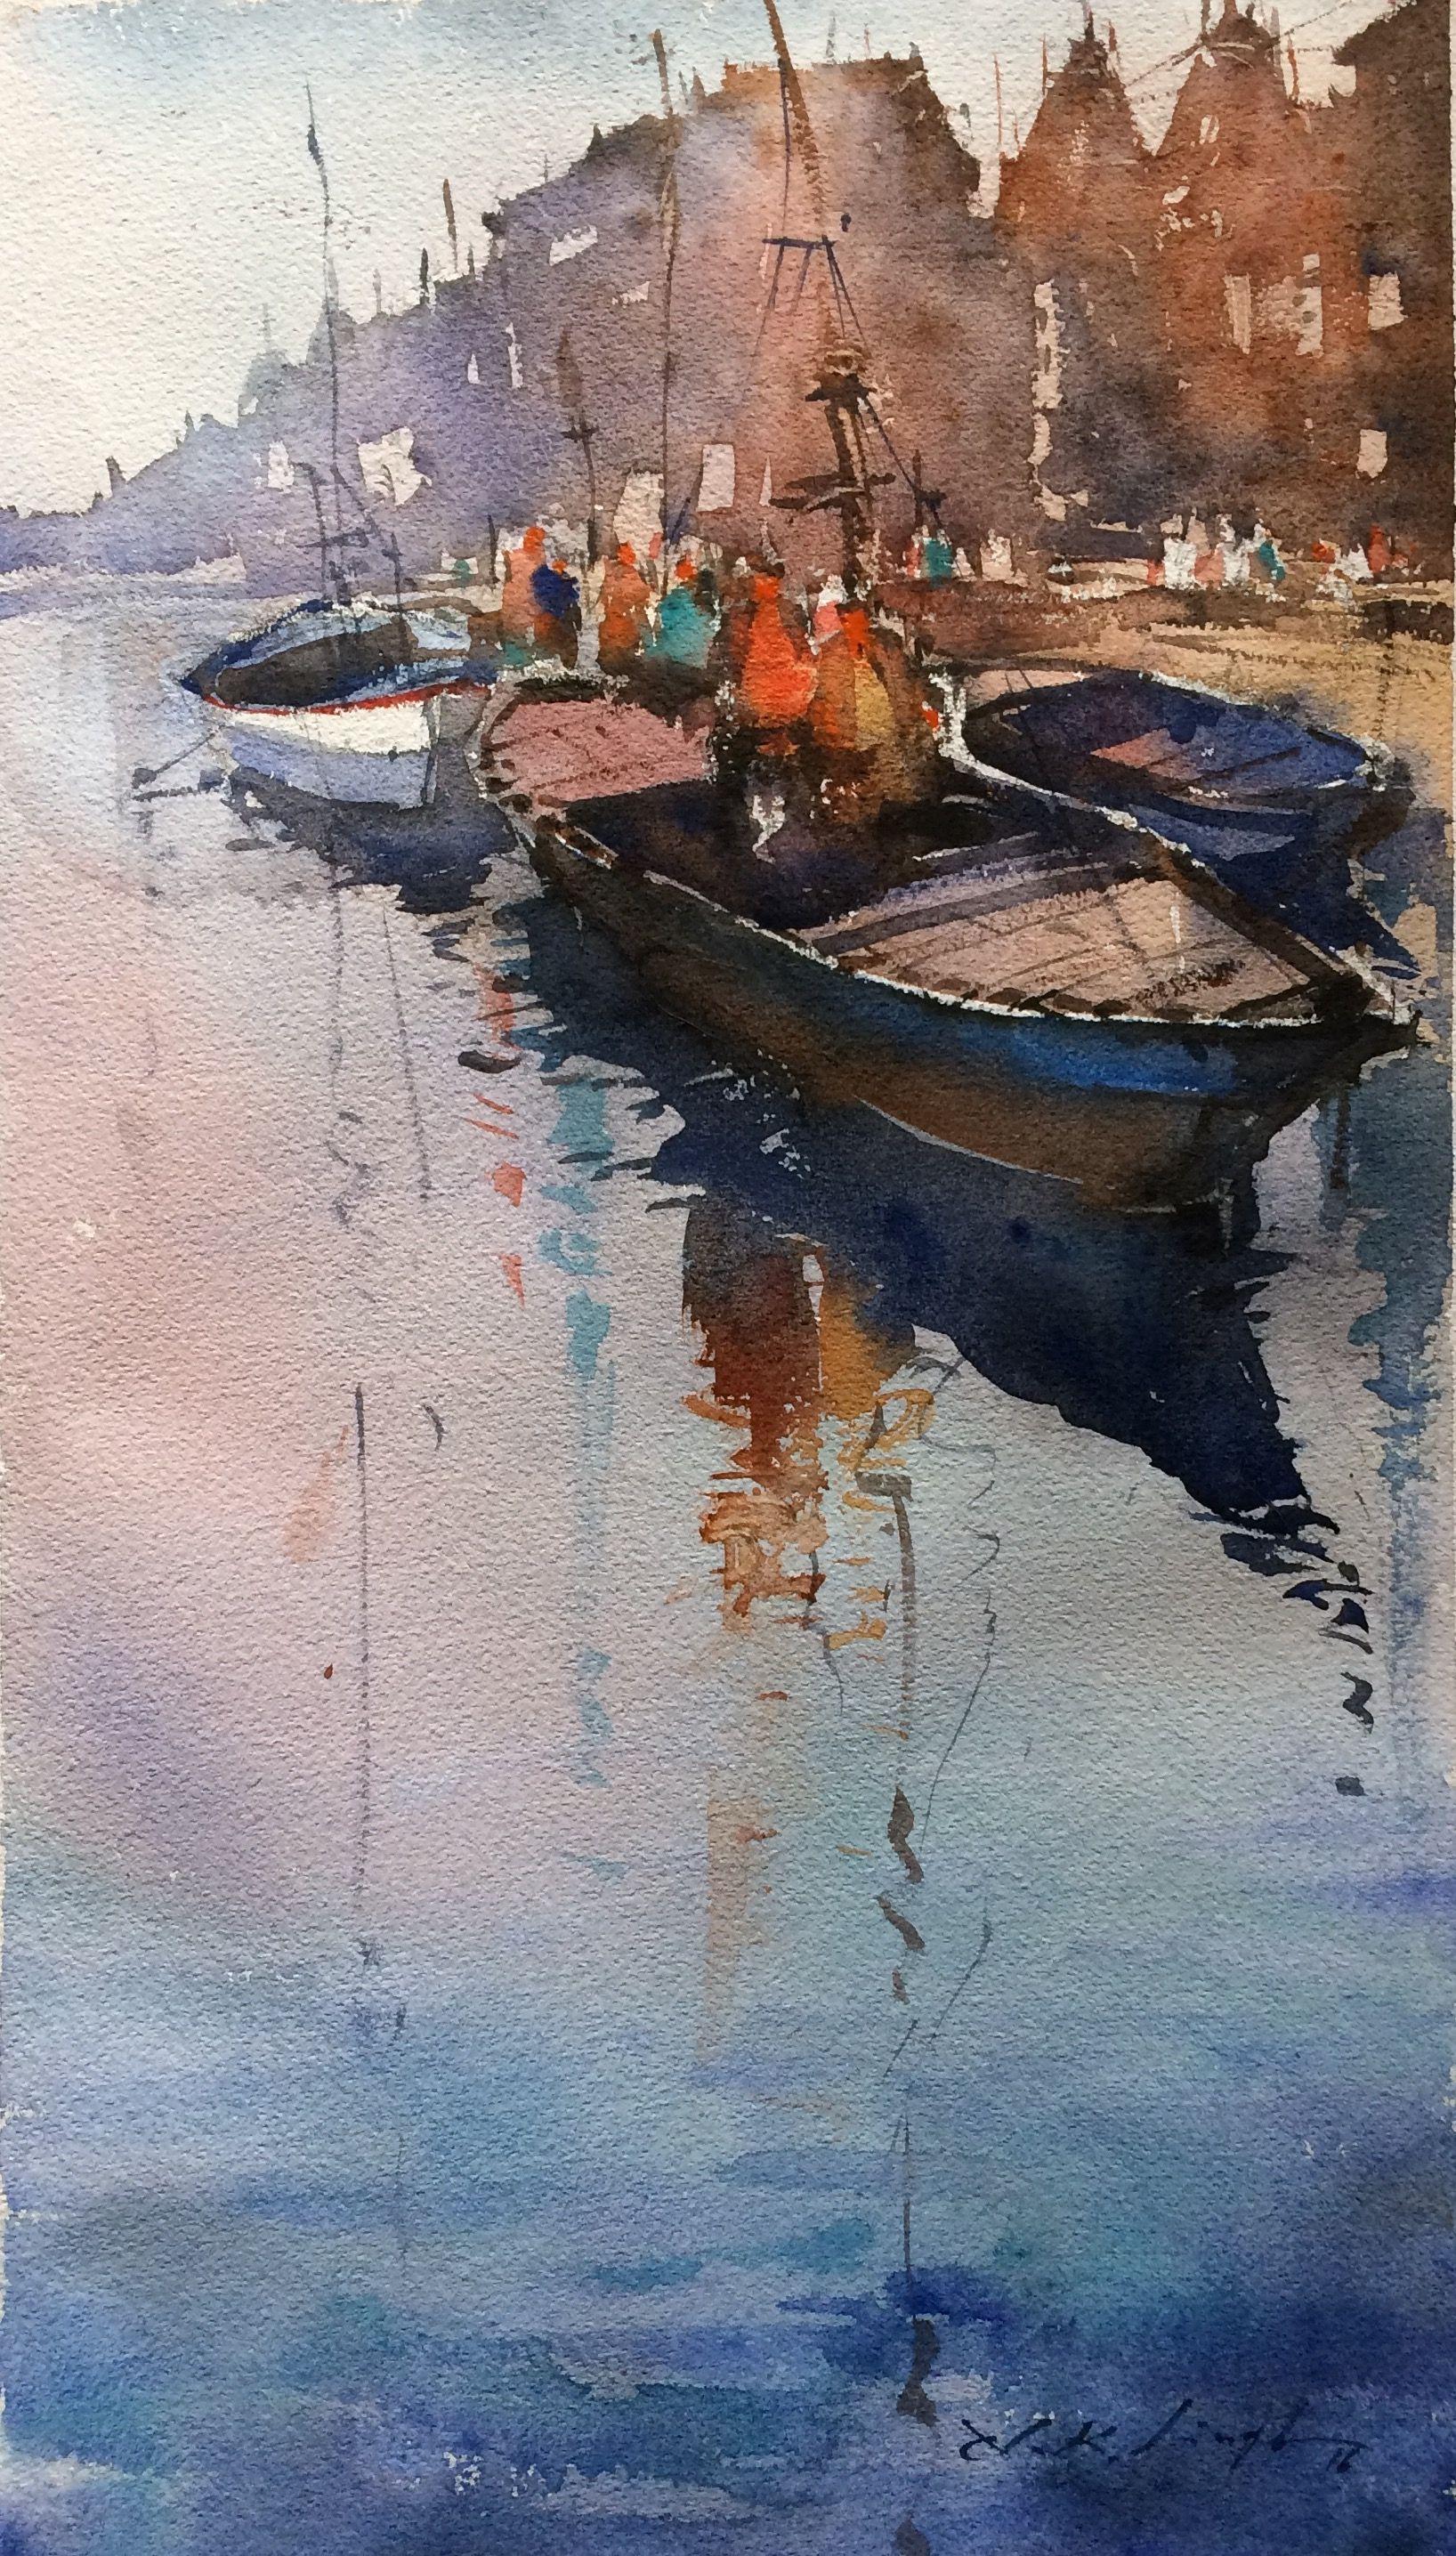 online art gallery of water paint art original art for sale nitin singh